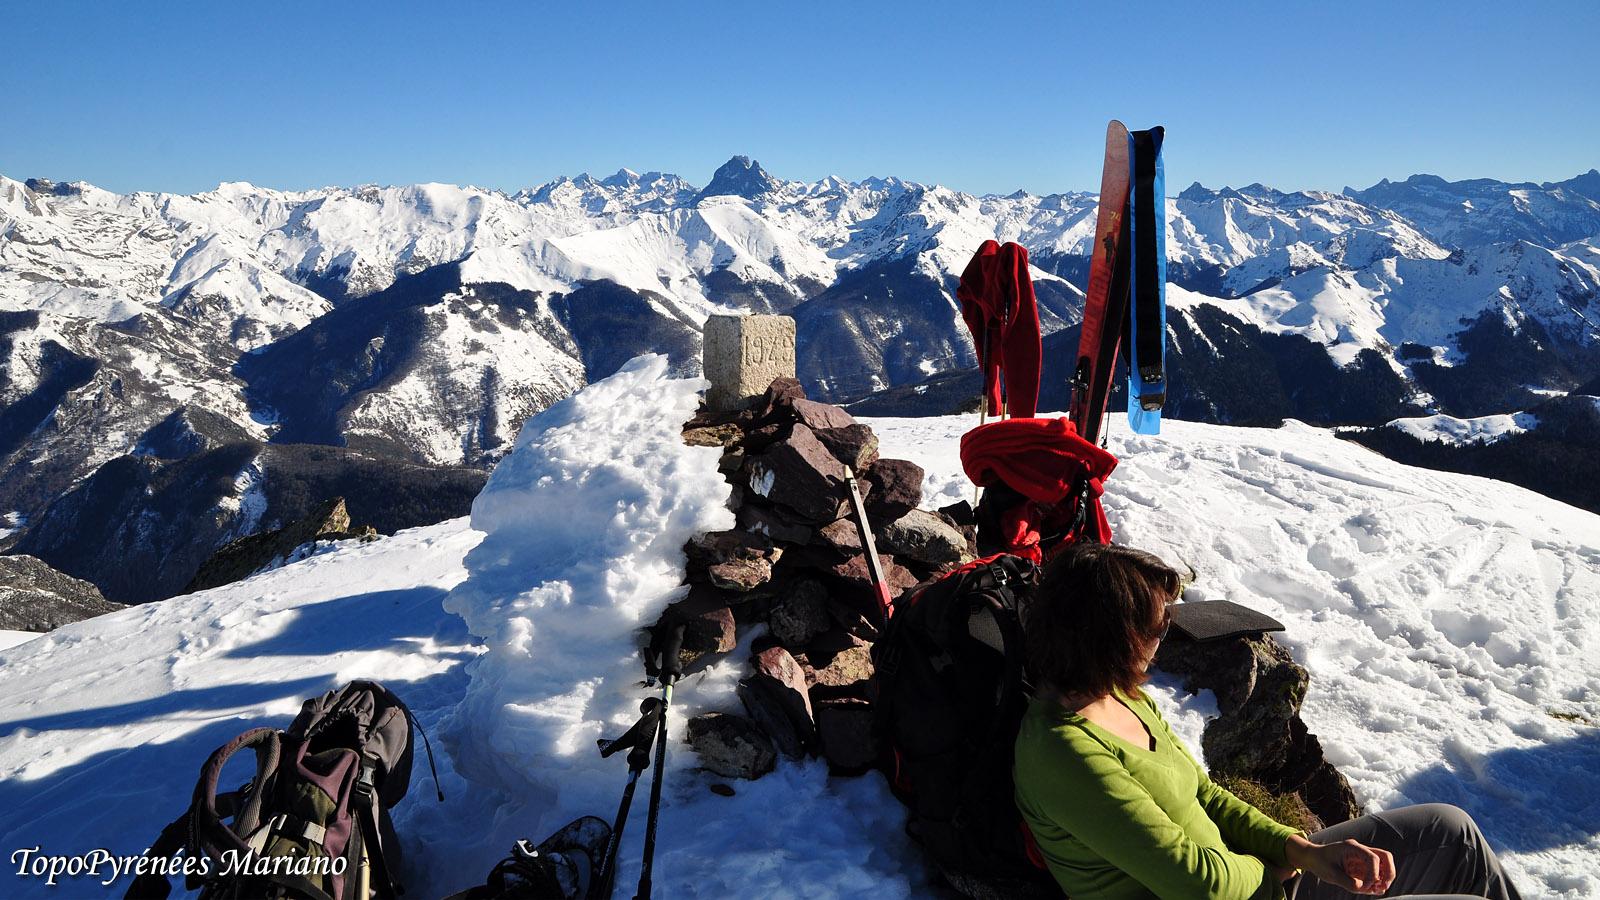 Raquettes Pic Labigouer (2175m)